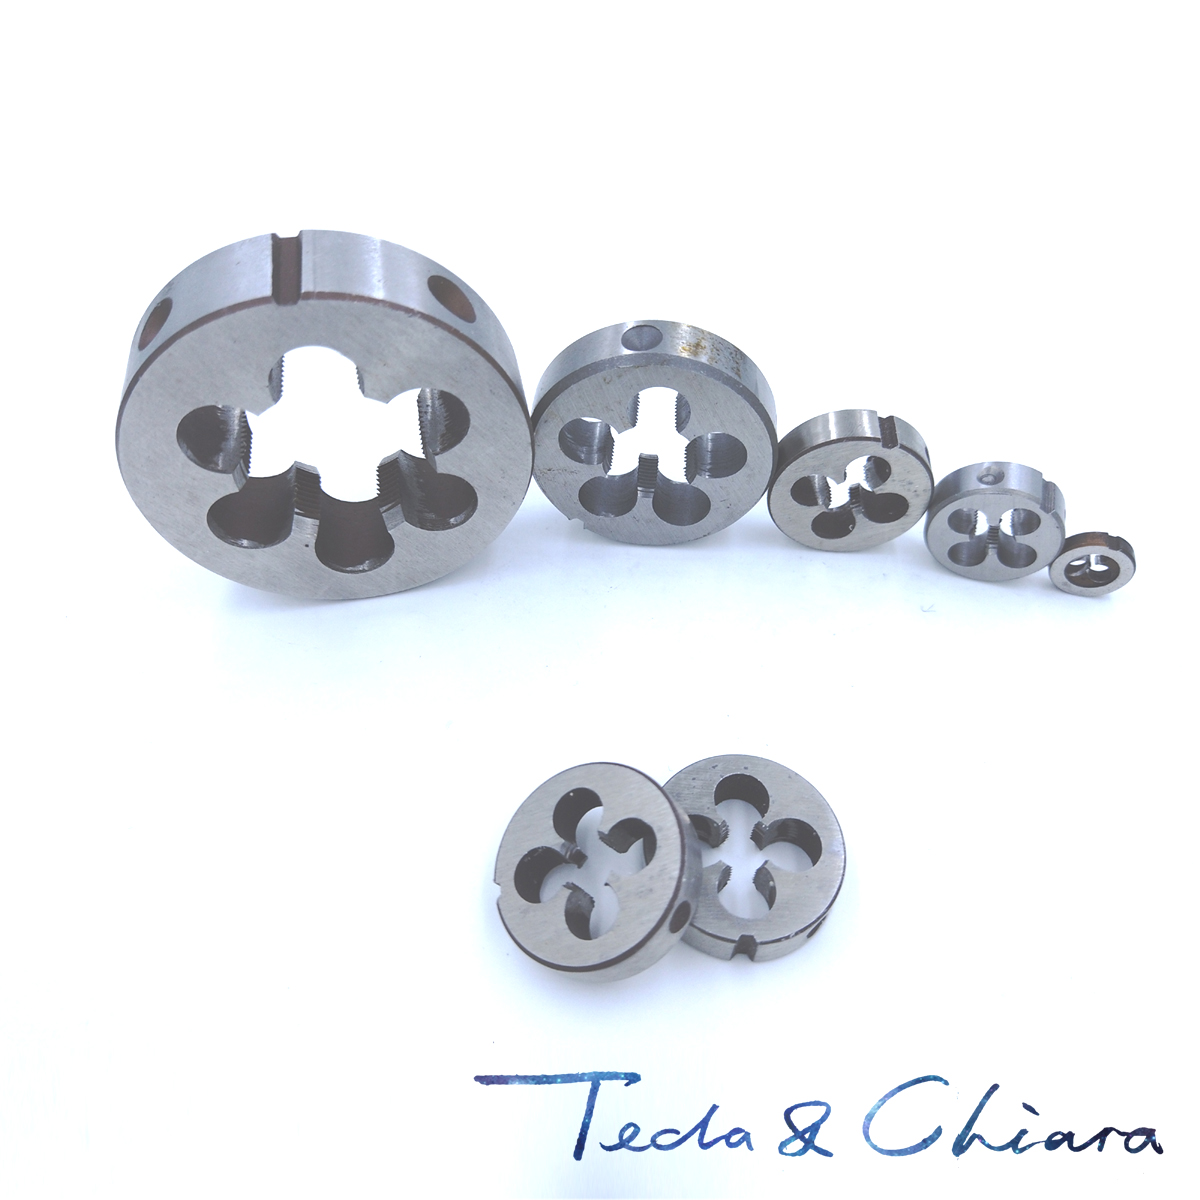 1Pc M22 X 0.75mm 1mm 1.25mm 1.5mm 1.75mm 2mm 2.5mm Metric Right Hand Die Threading Tools Mold Machining * 1 1.25 1.5 1.75 2 2.5